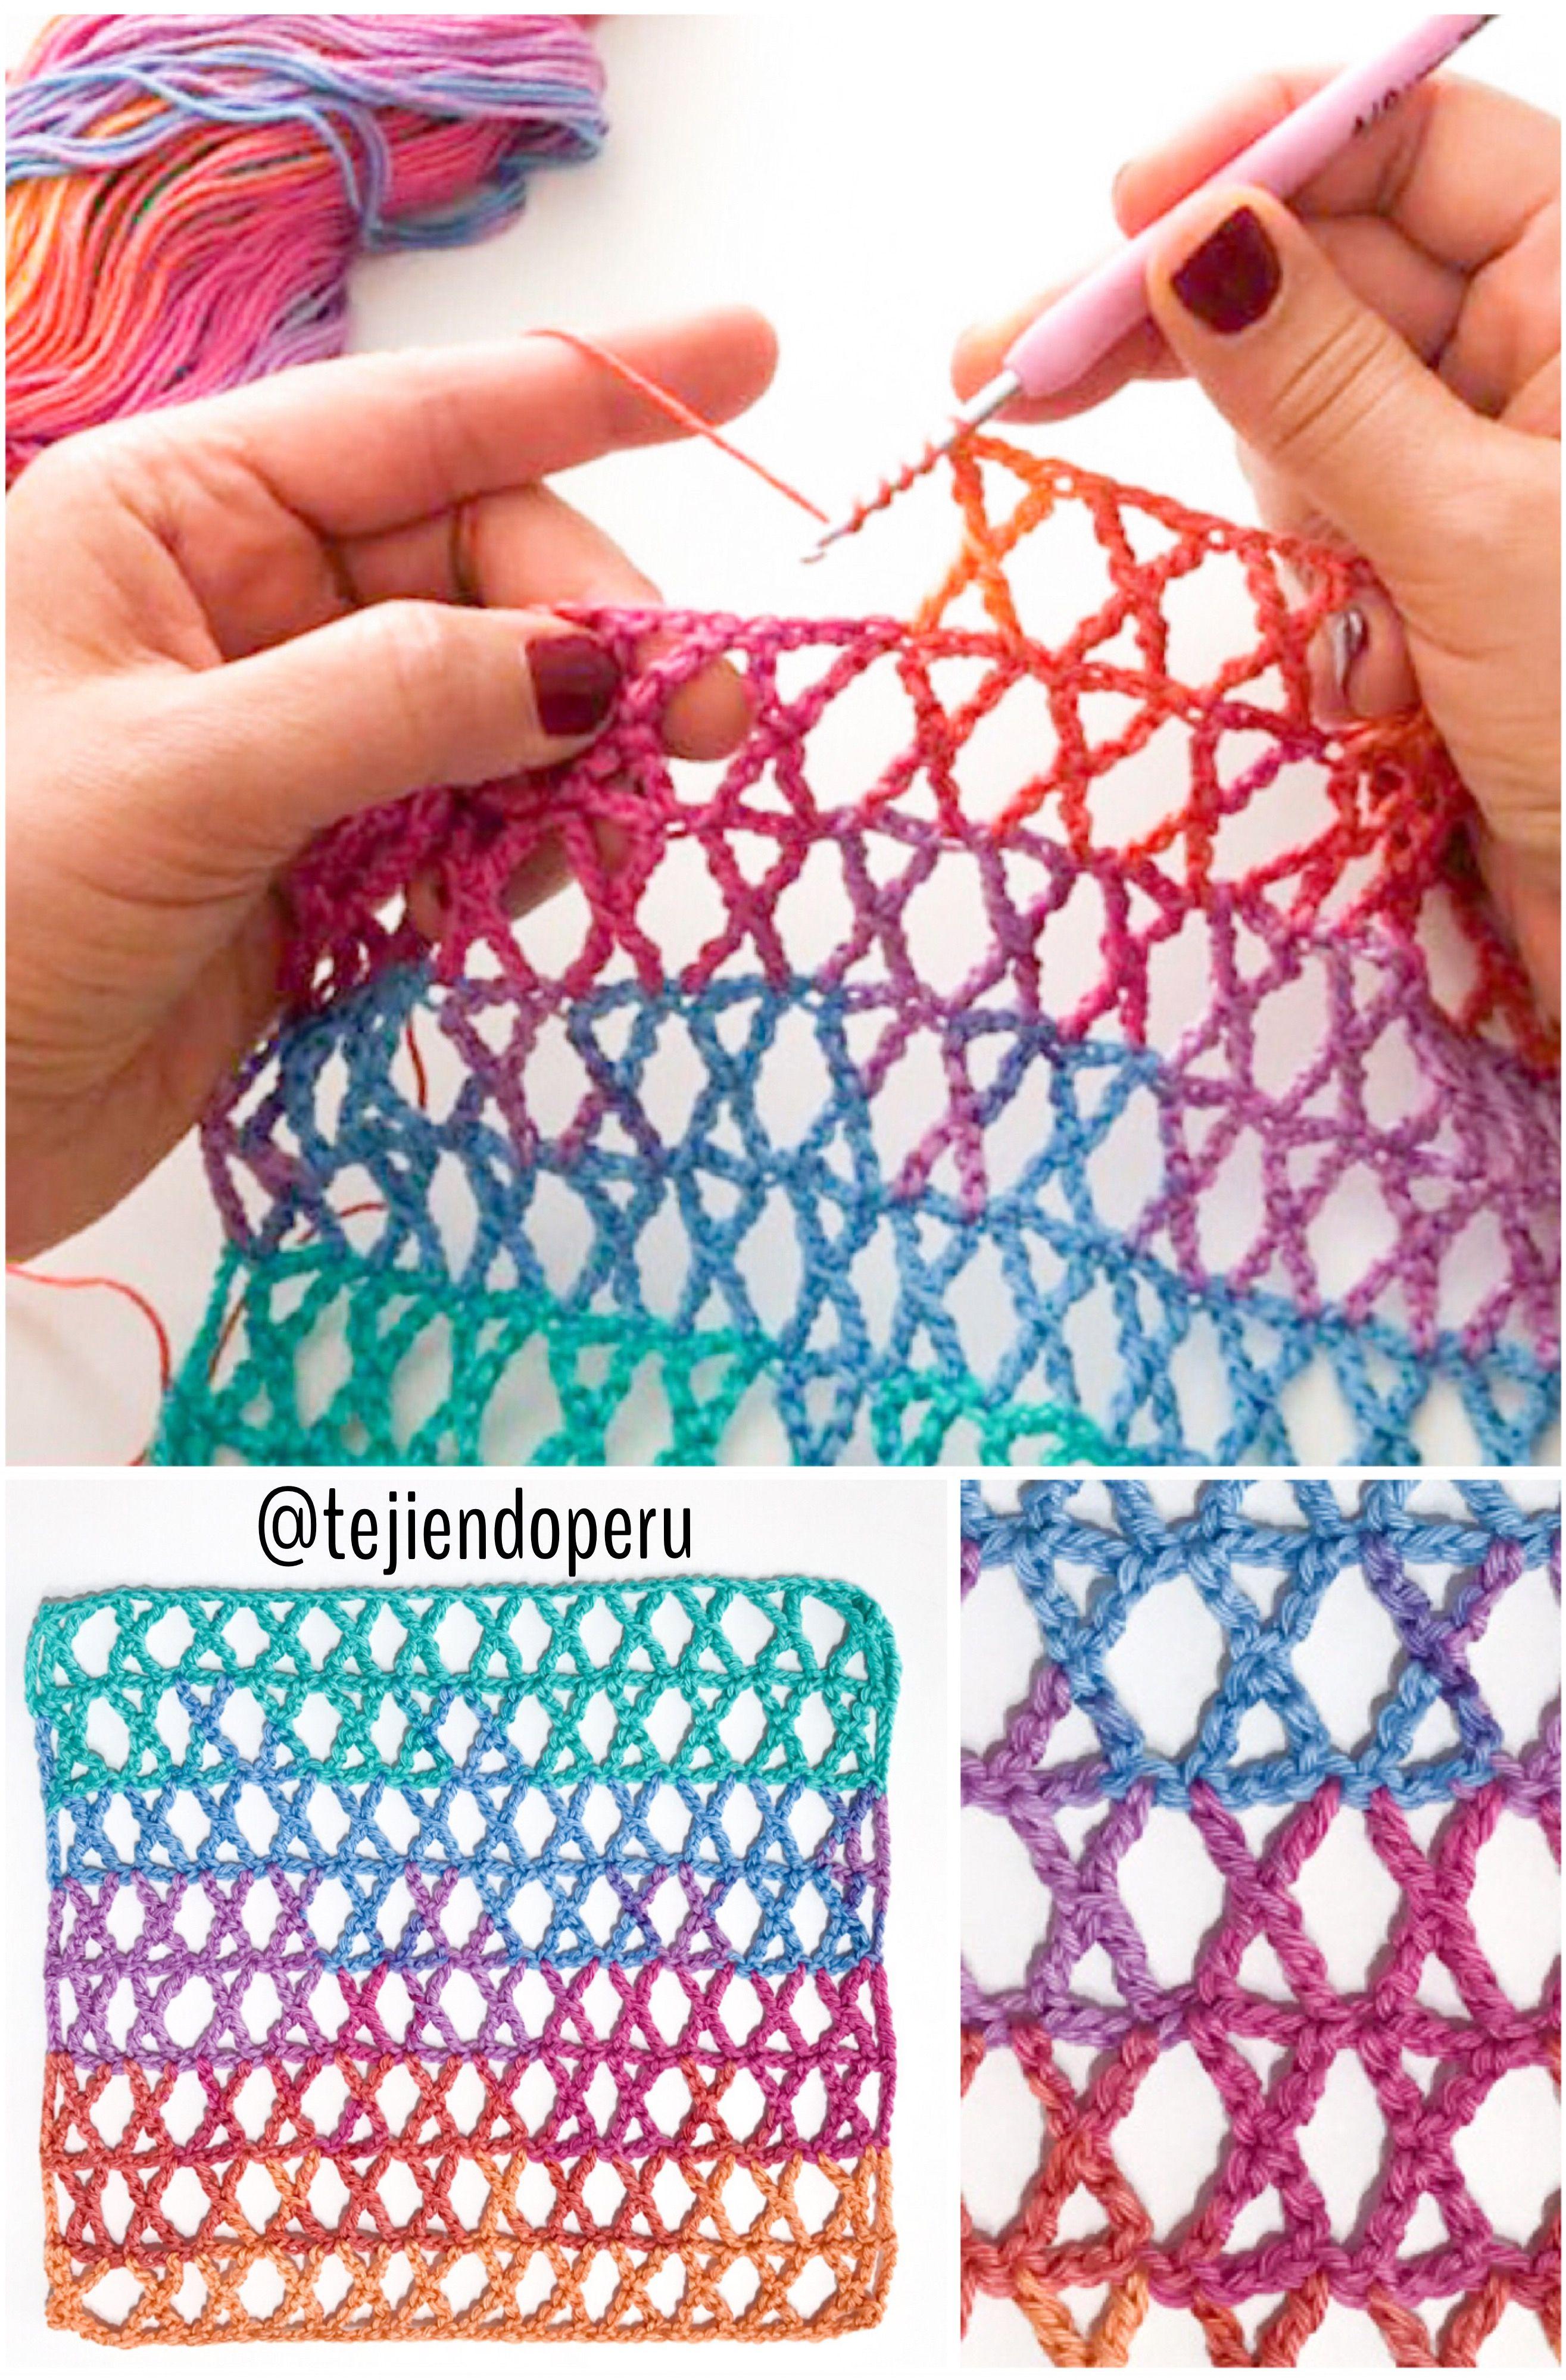 Punto K Tejido A Crochet Crochet K Stitch Capas Y Chal Croché